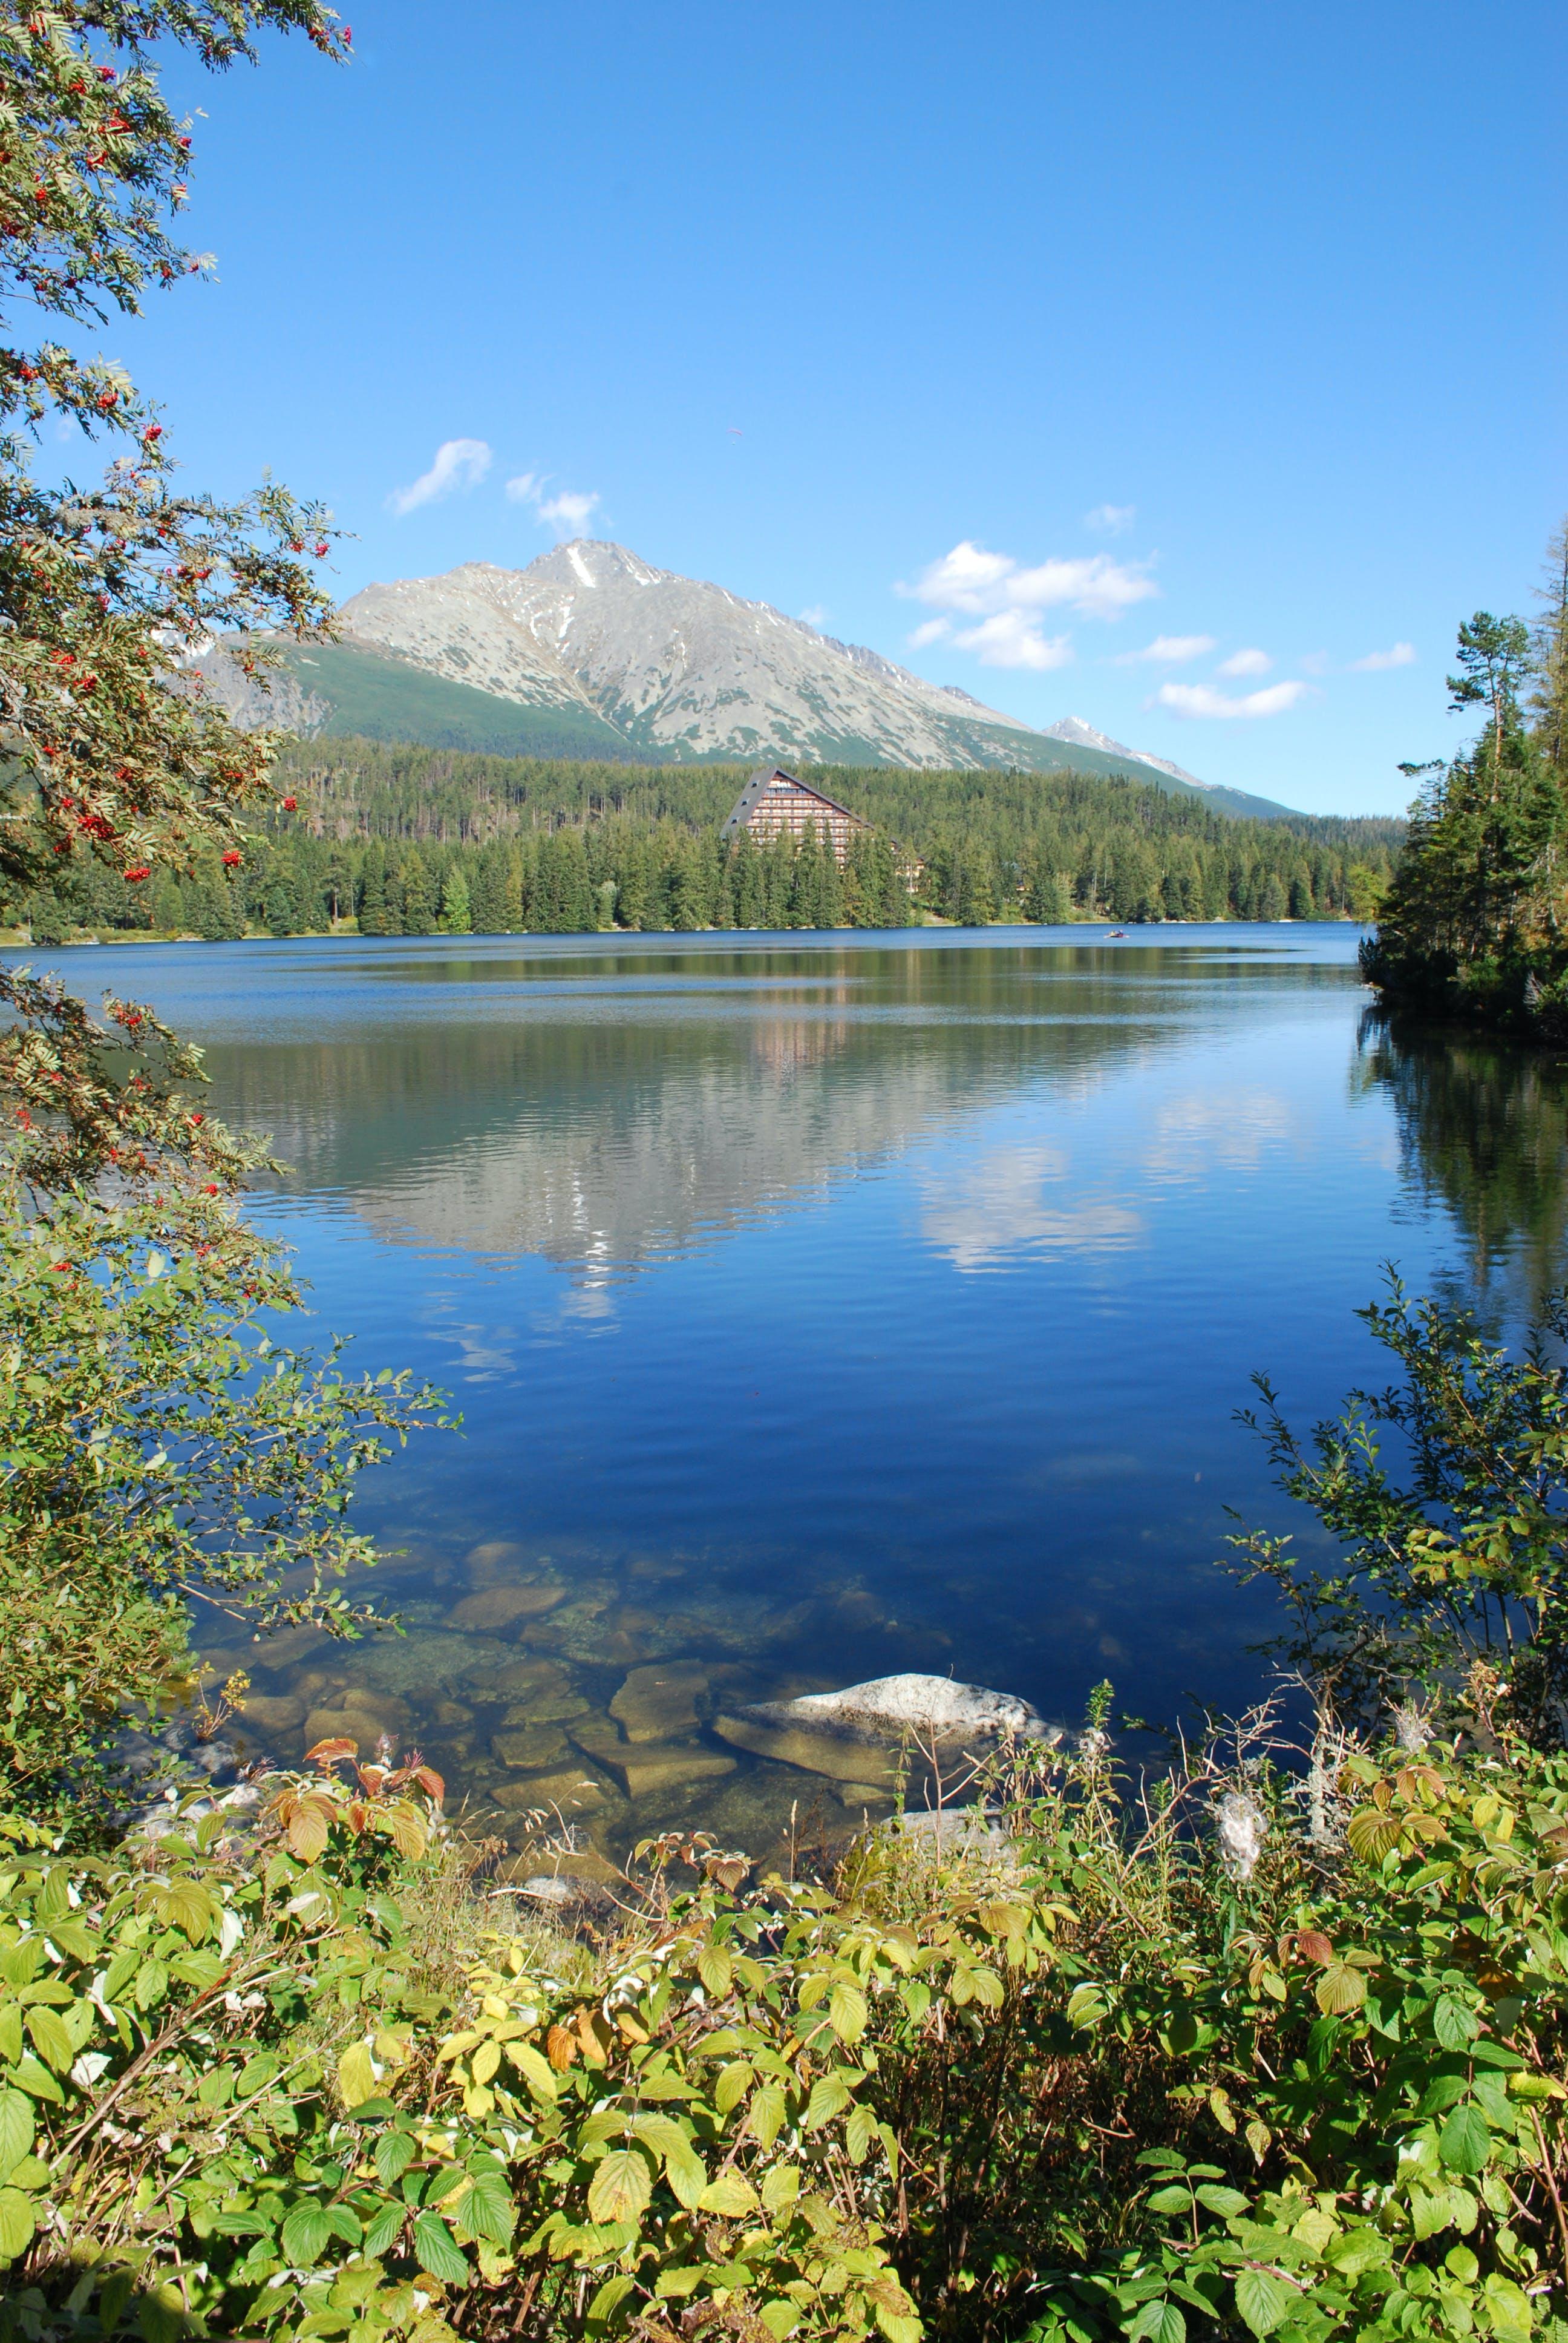 Gratis lagerfoto af bjerge, refleksion